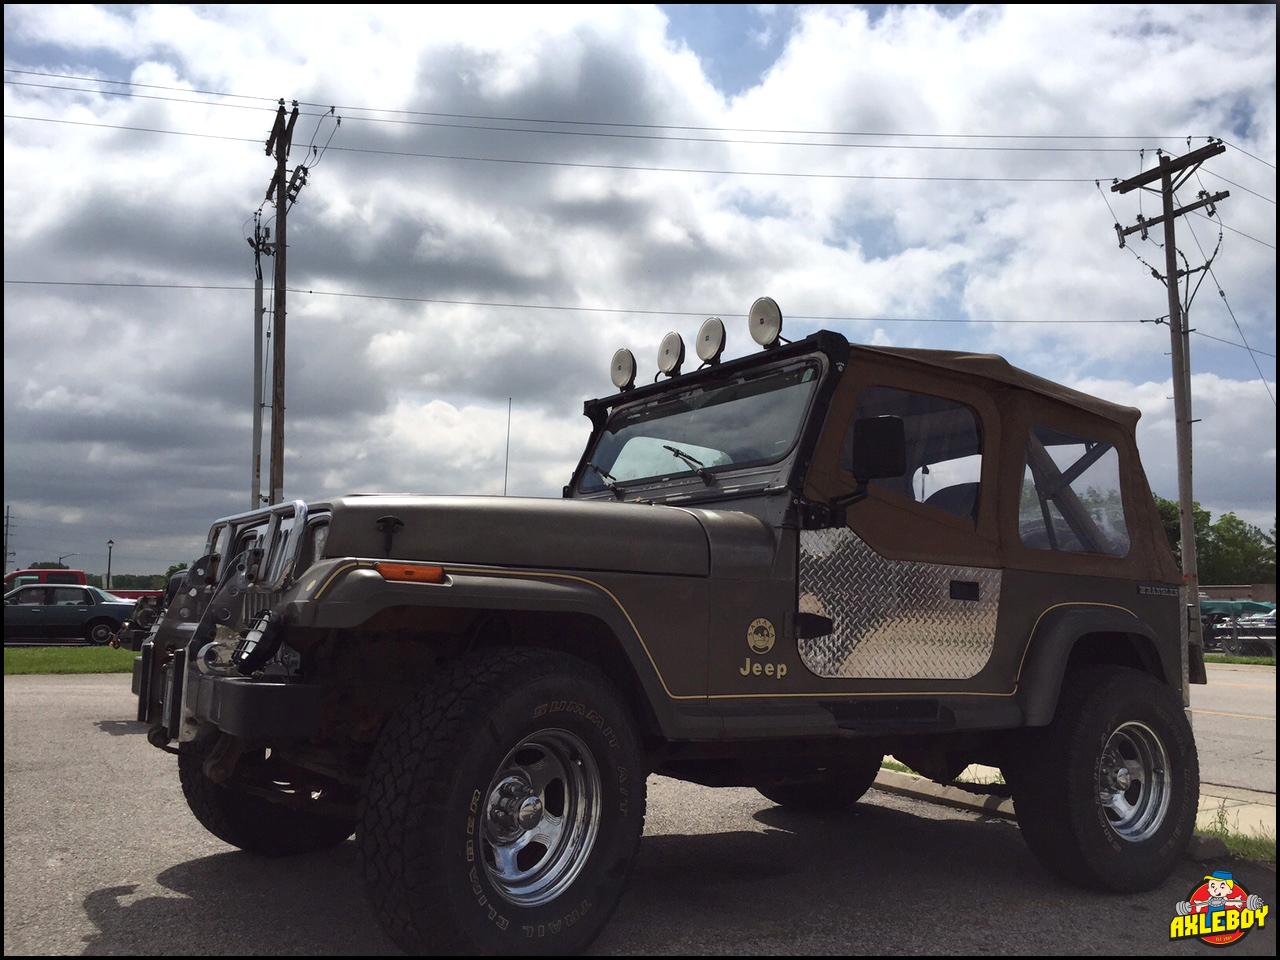 1989 jeep wrangler sahara yj dropped off at axleboy for